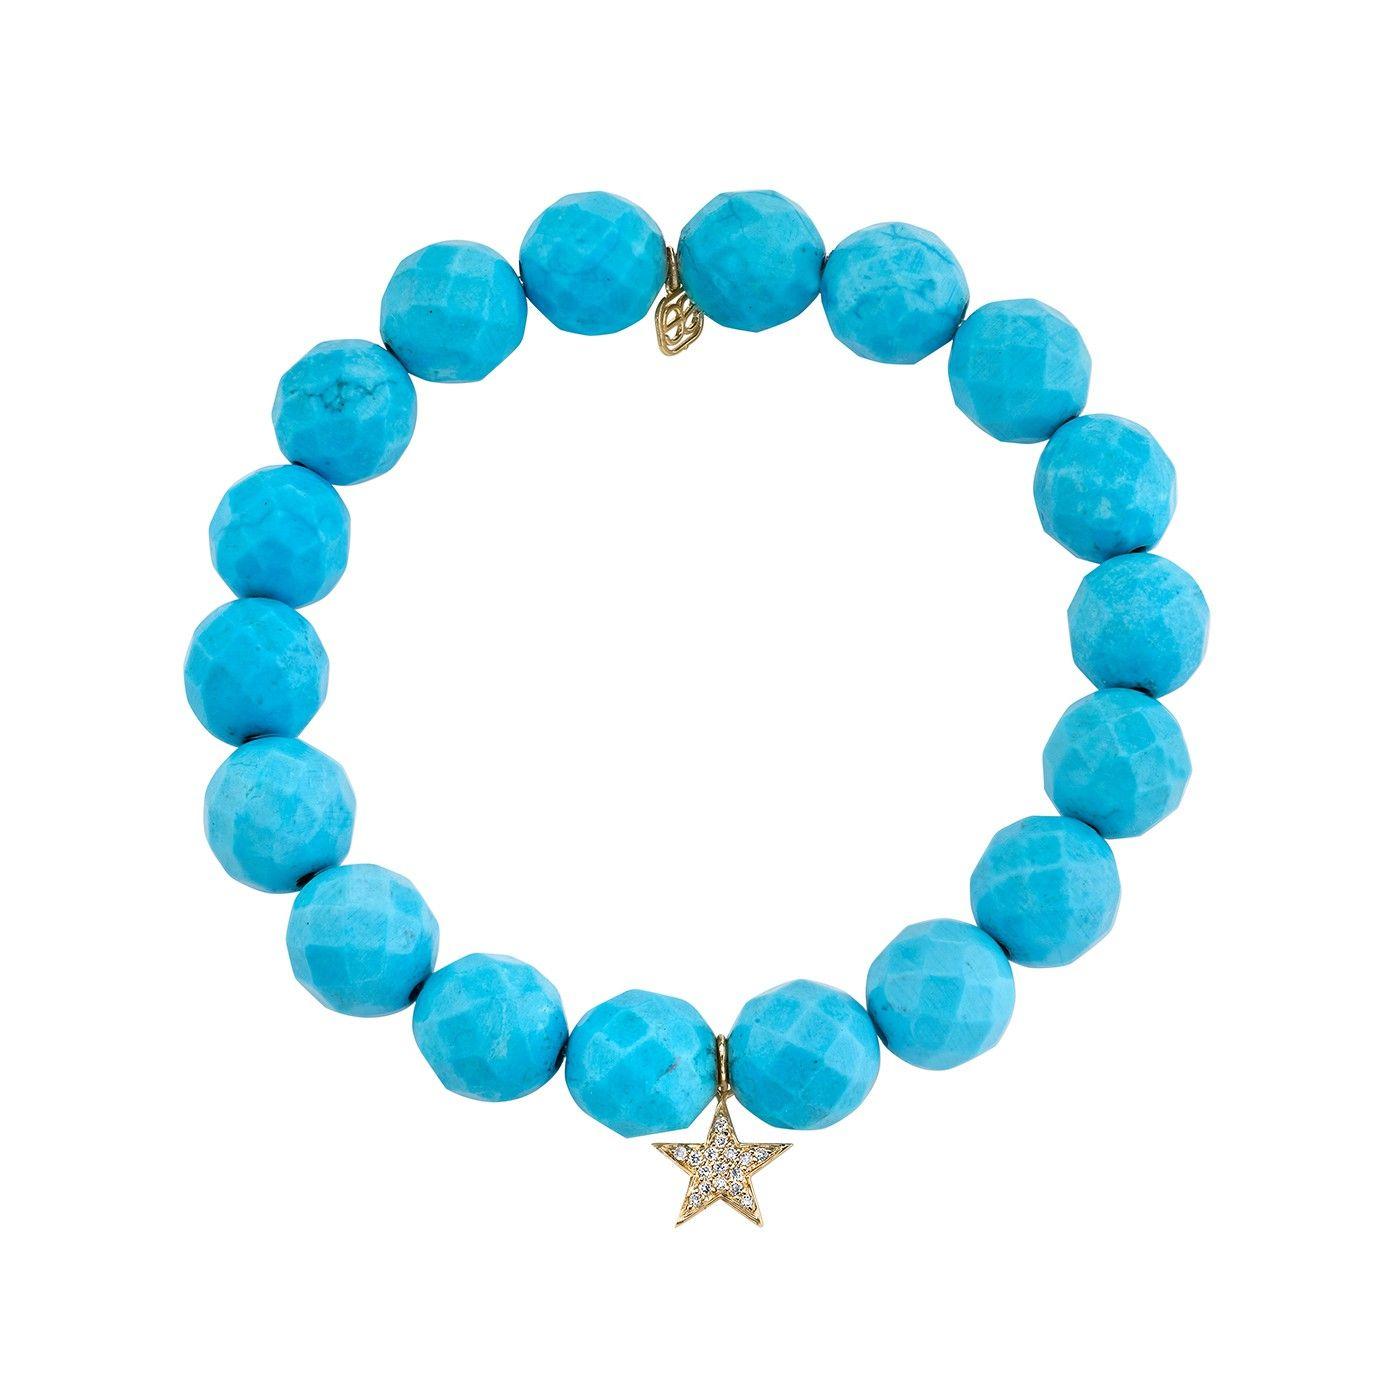 Yellow-Gold & Pave Diamond Star on Turquoise Magnesite